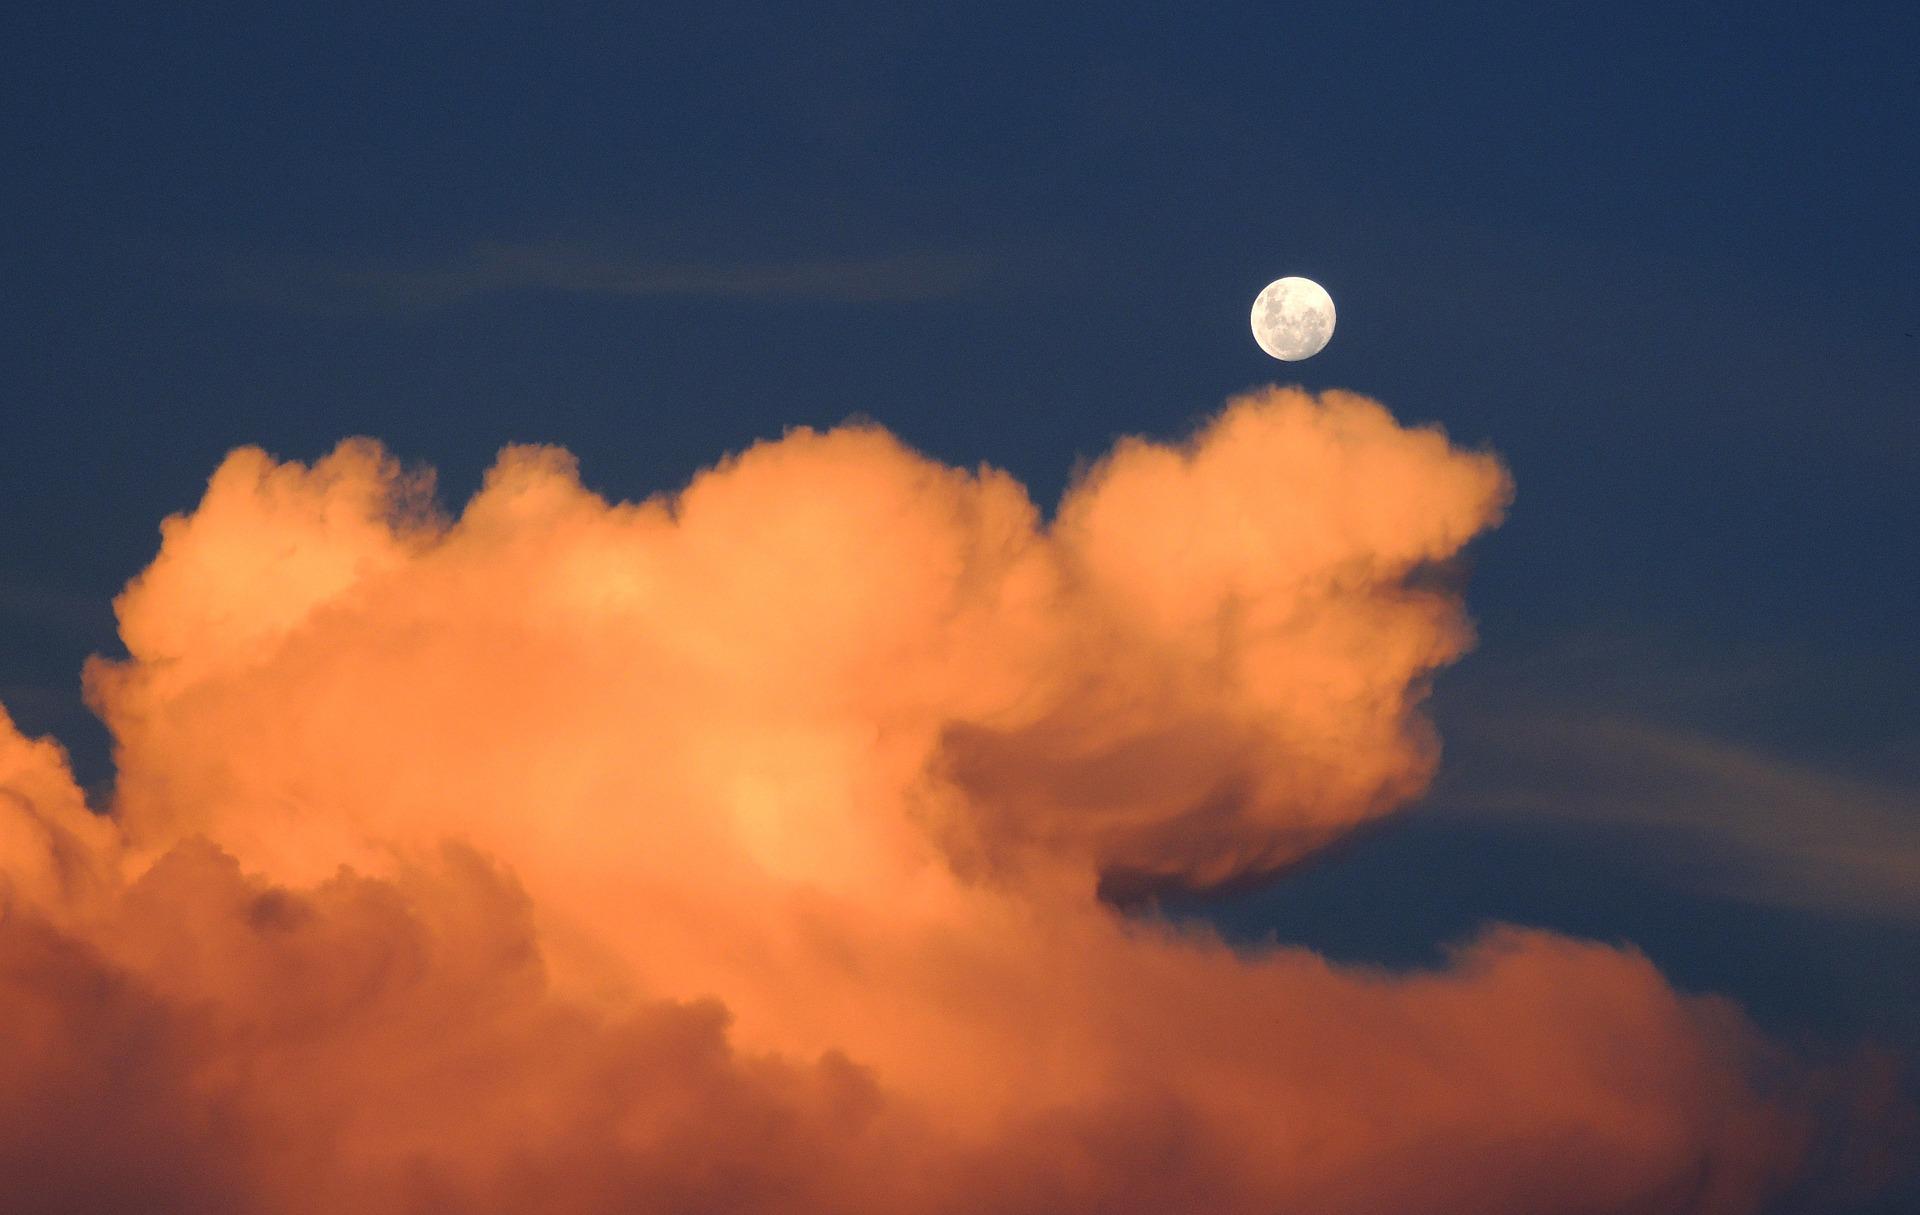 clouds-323426_1920.jpg